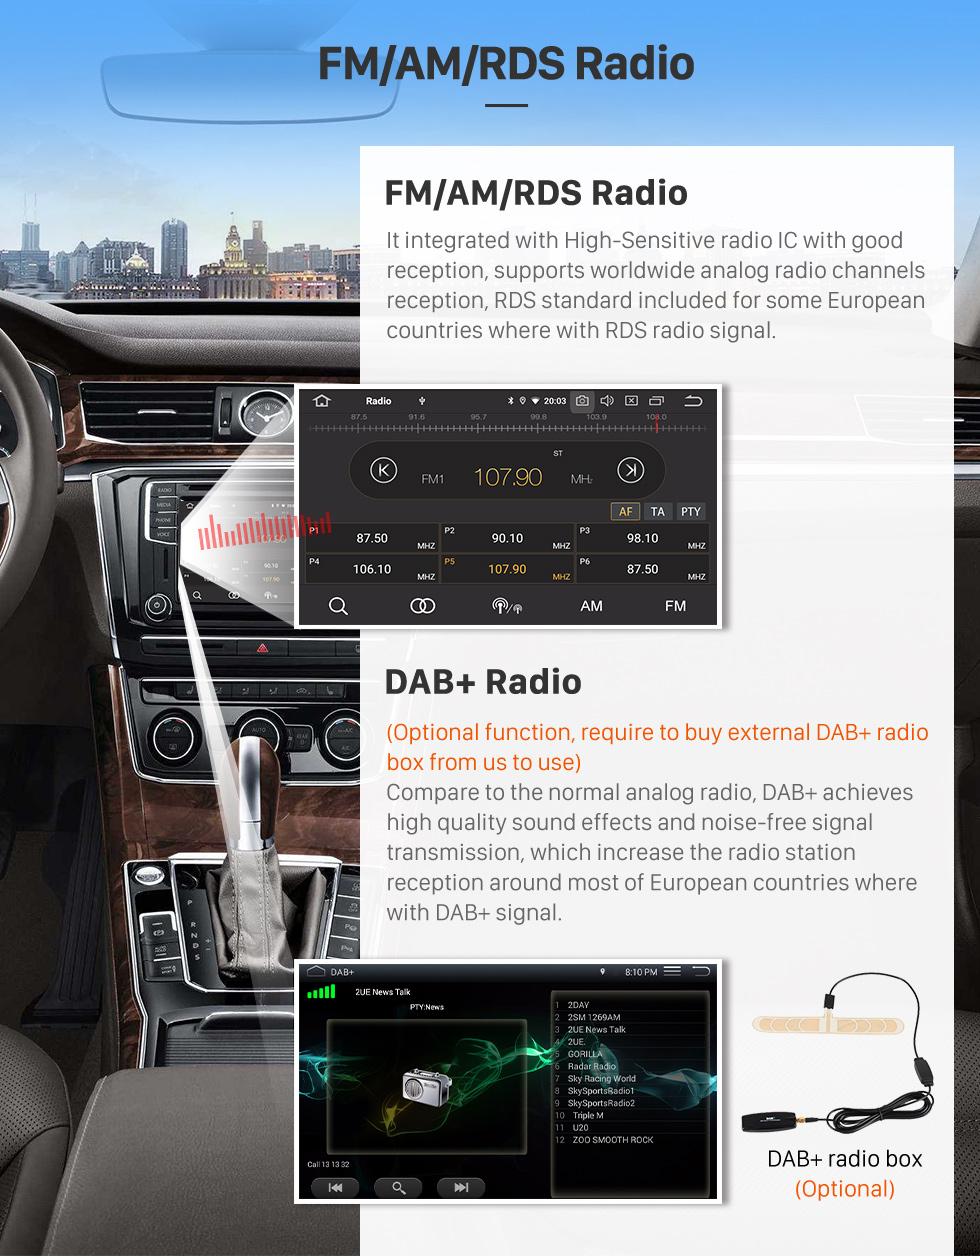 Seicane OEM 9 inch Android 9.0 Radio for 2015 Mahindra Scorpio Manual A/C Bluetooth Wifi HD Touchscreen GPS Navigation Carplay support DAB+ Rear camera